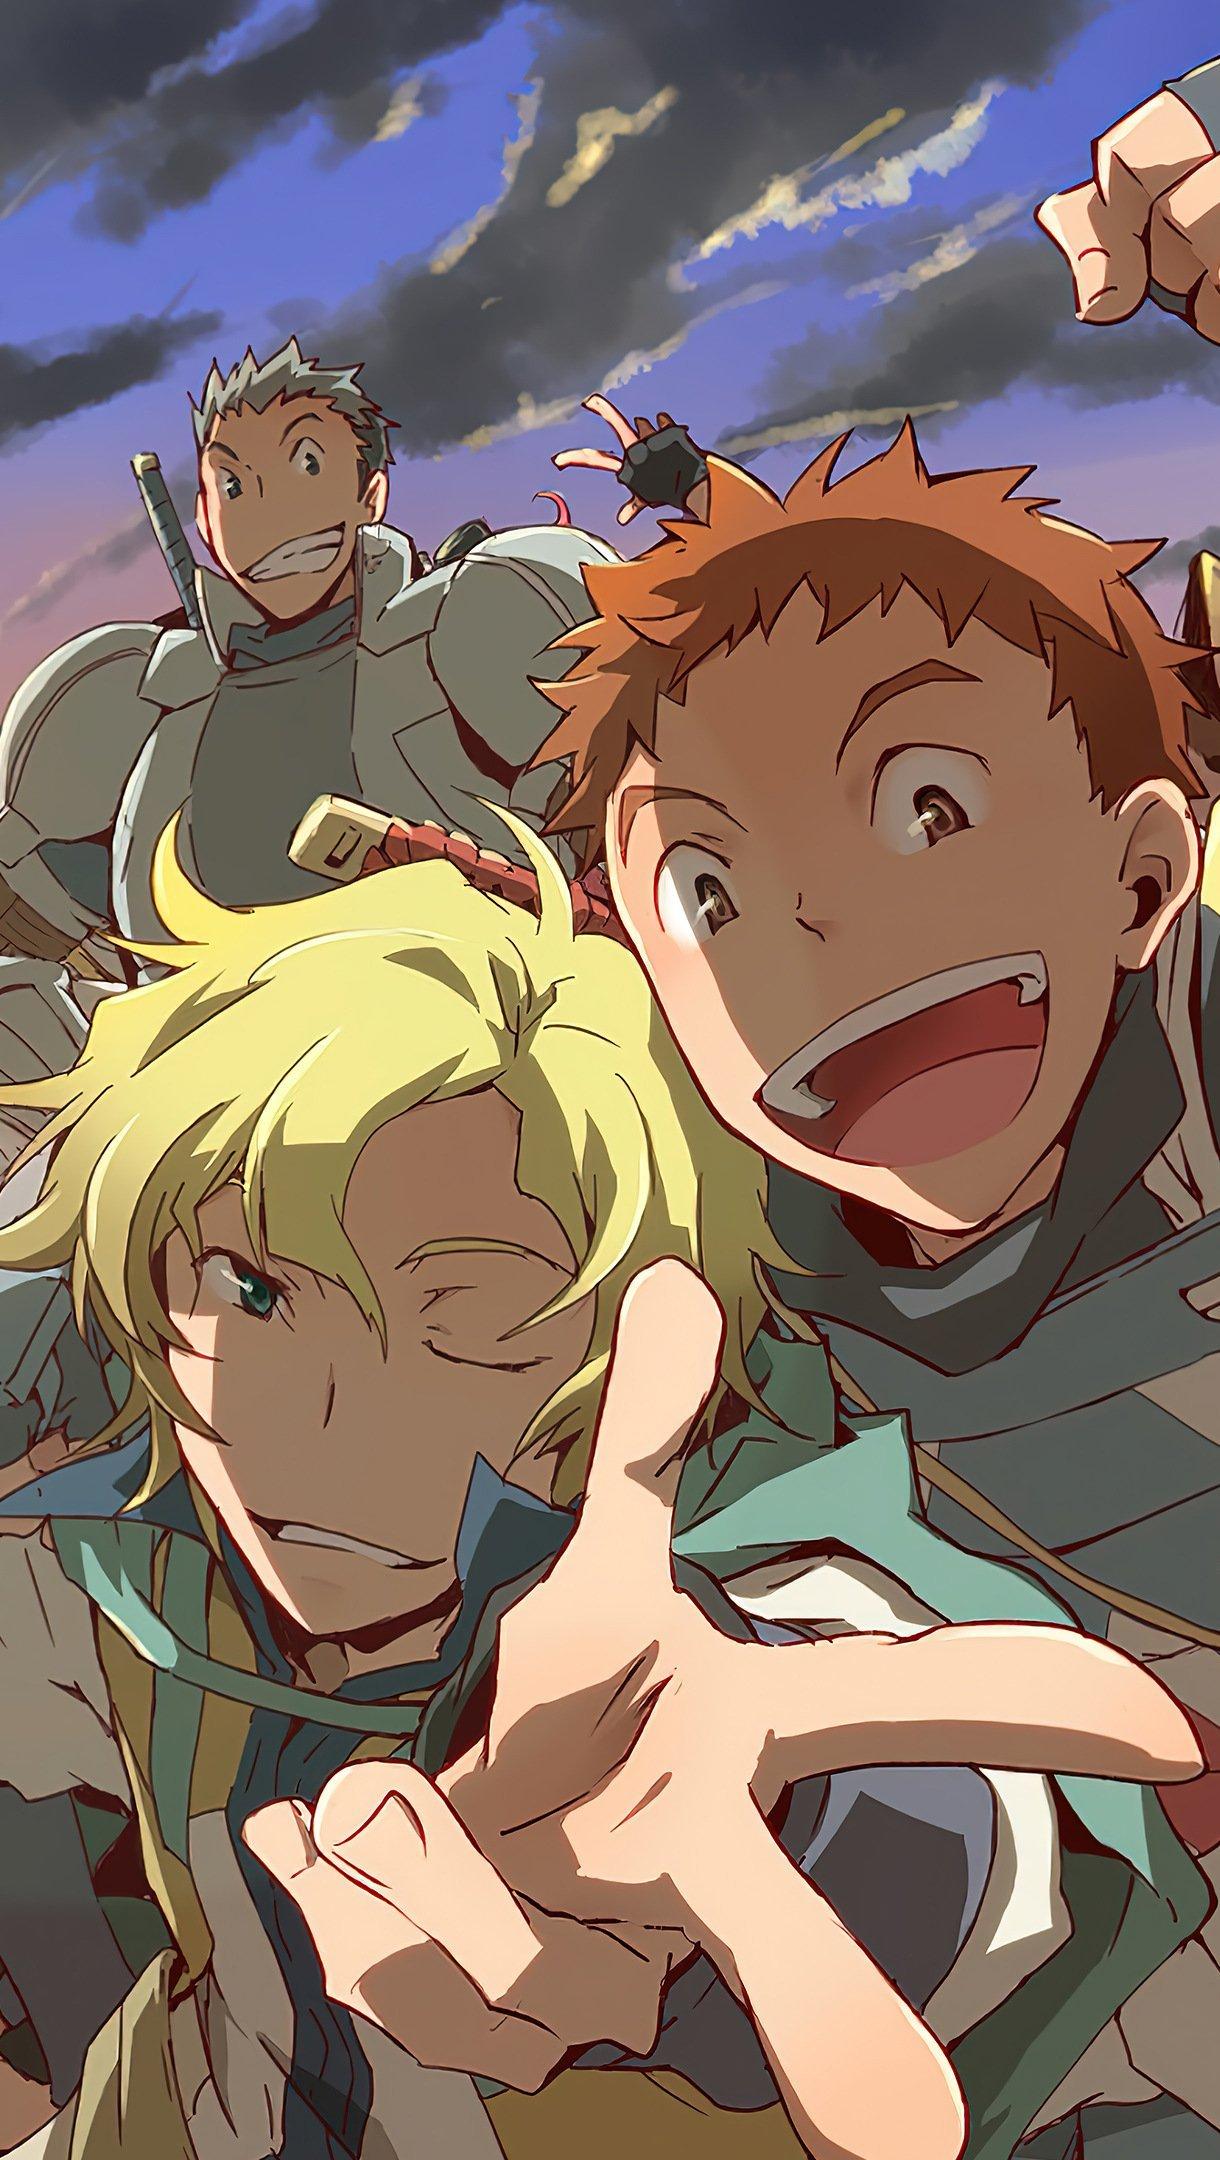 Fondos de pantalla Anime Personajes de Log Horizon Vertical